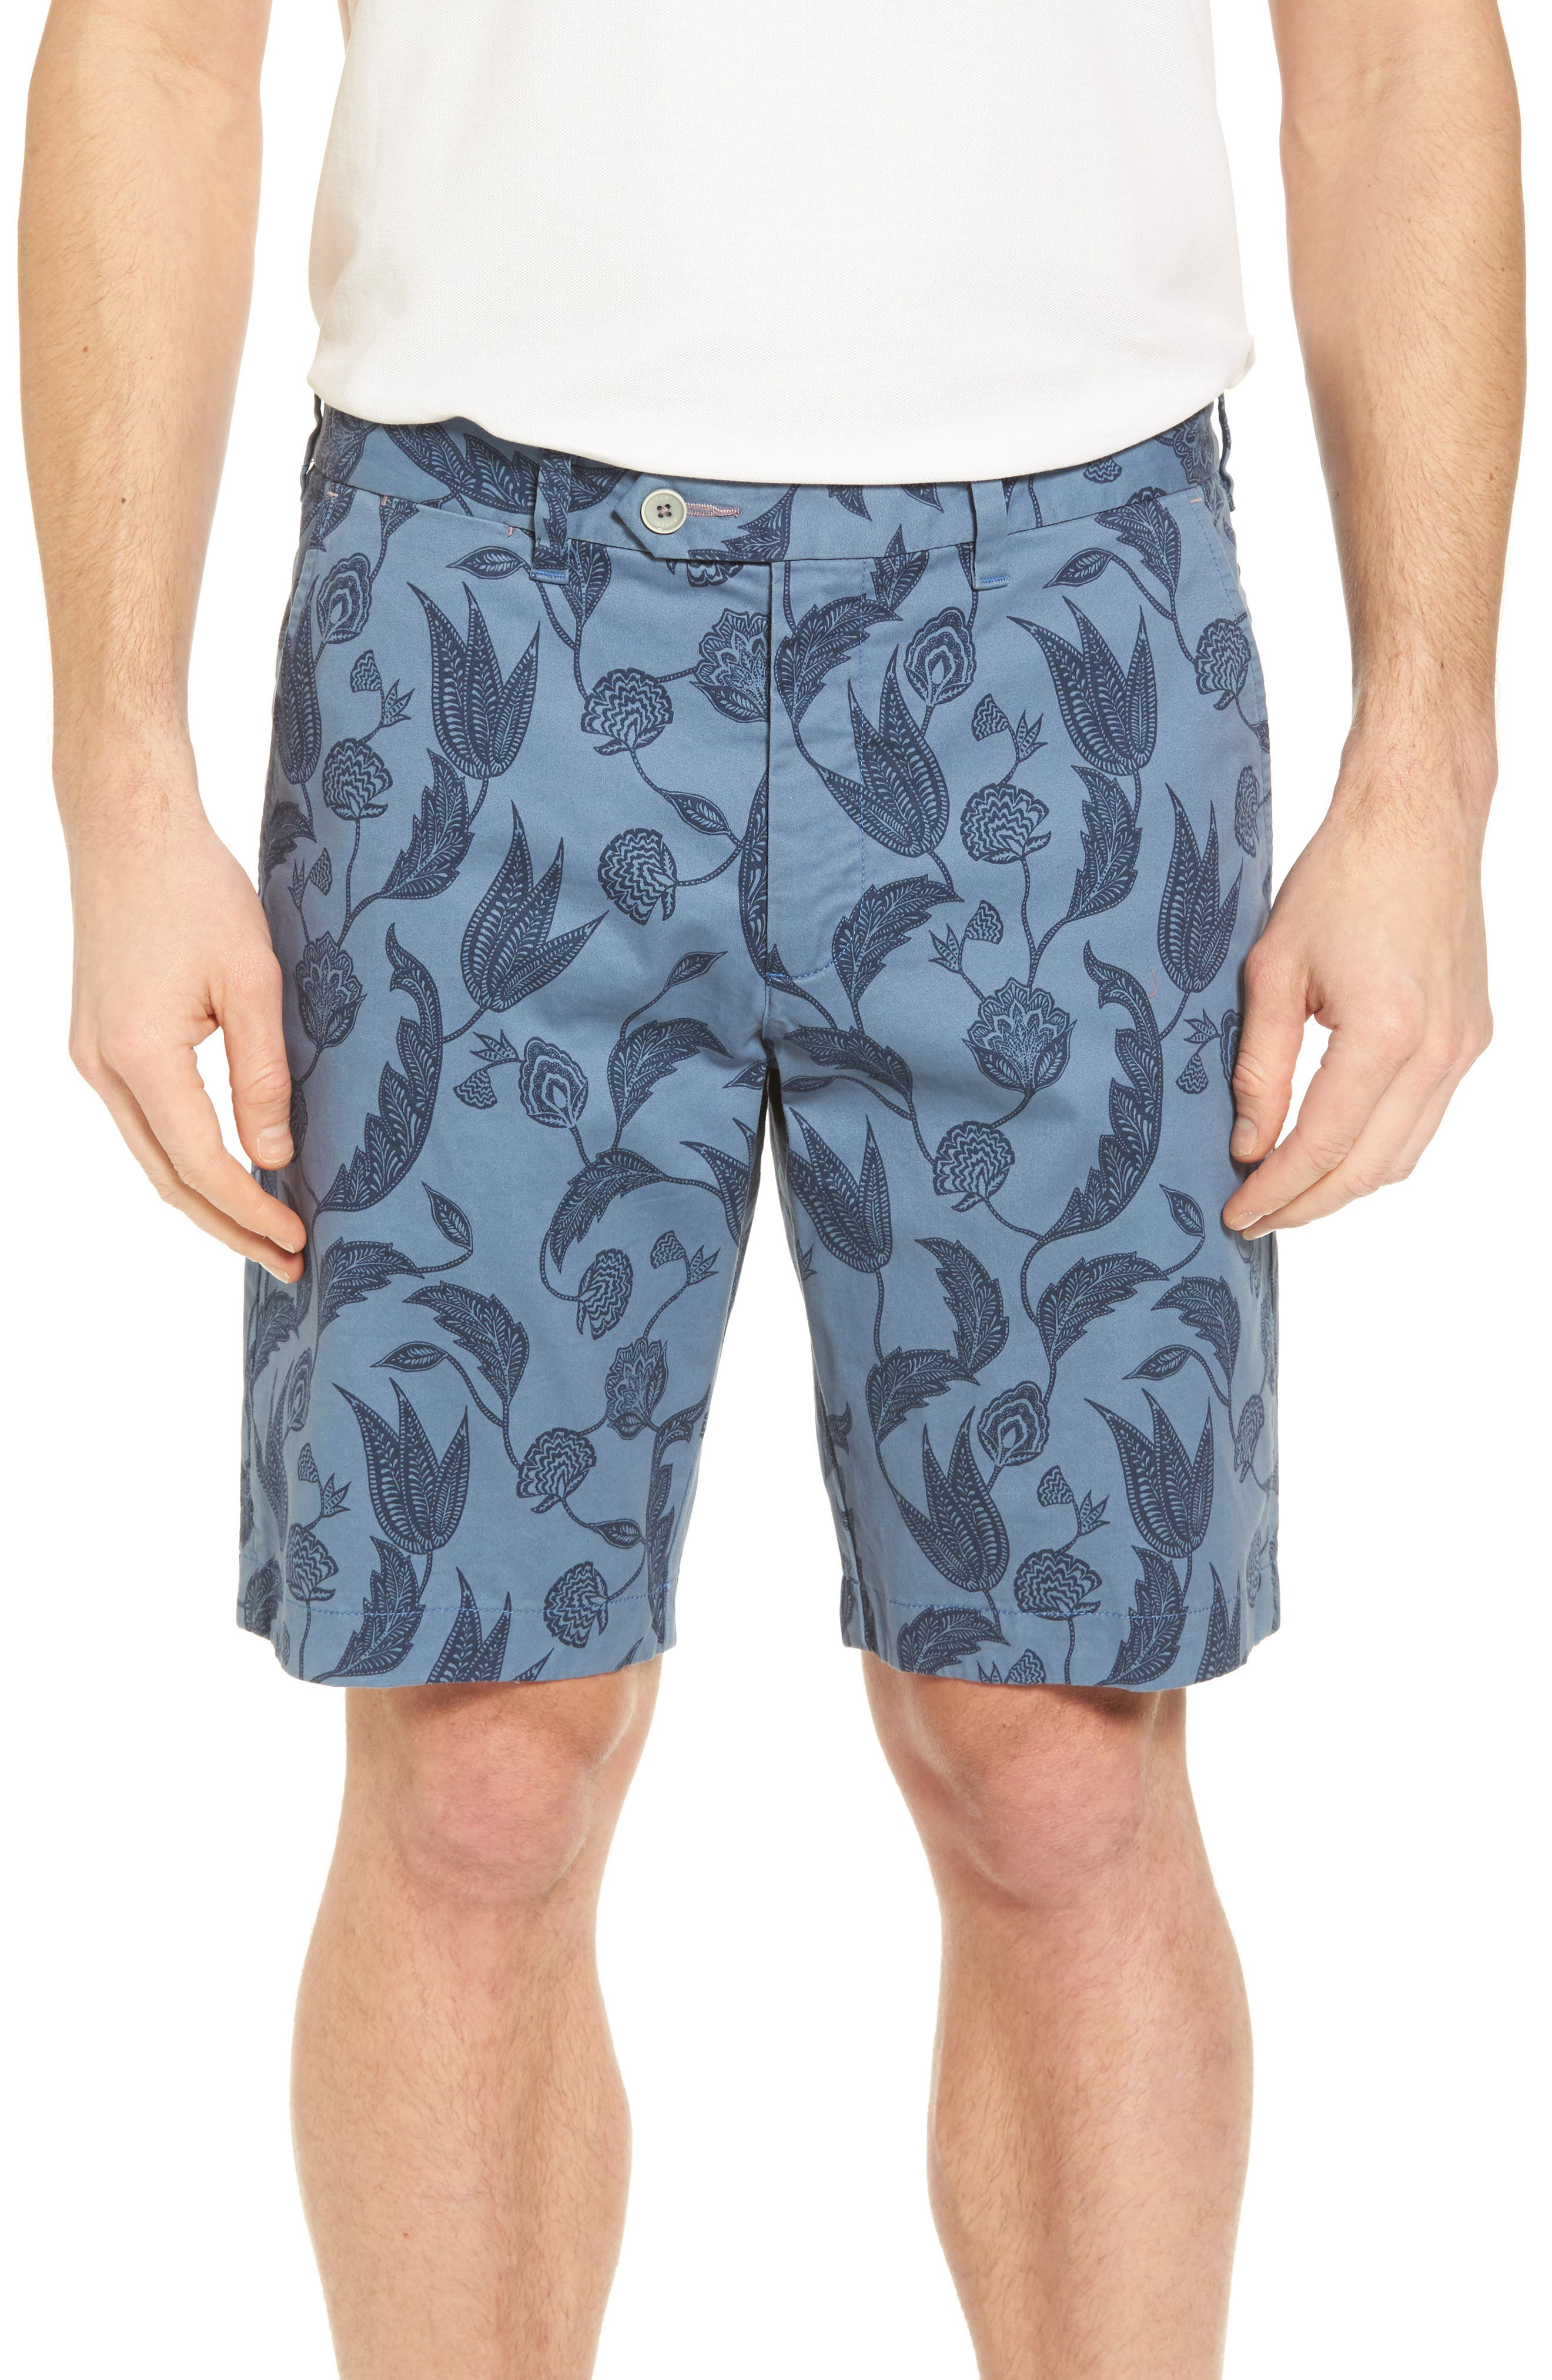 Uniprin Trim Fit Floral Golf Shorts,                             Main thumbnail 1, color,                             430